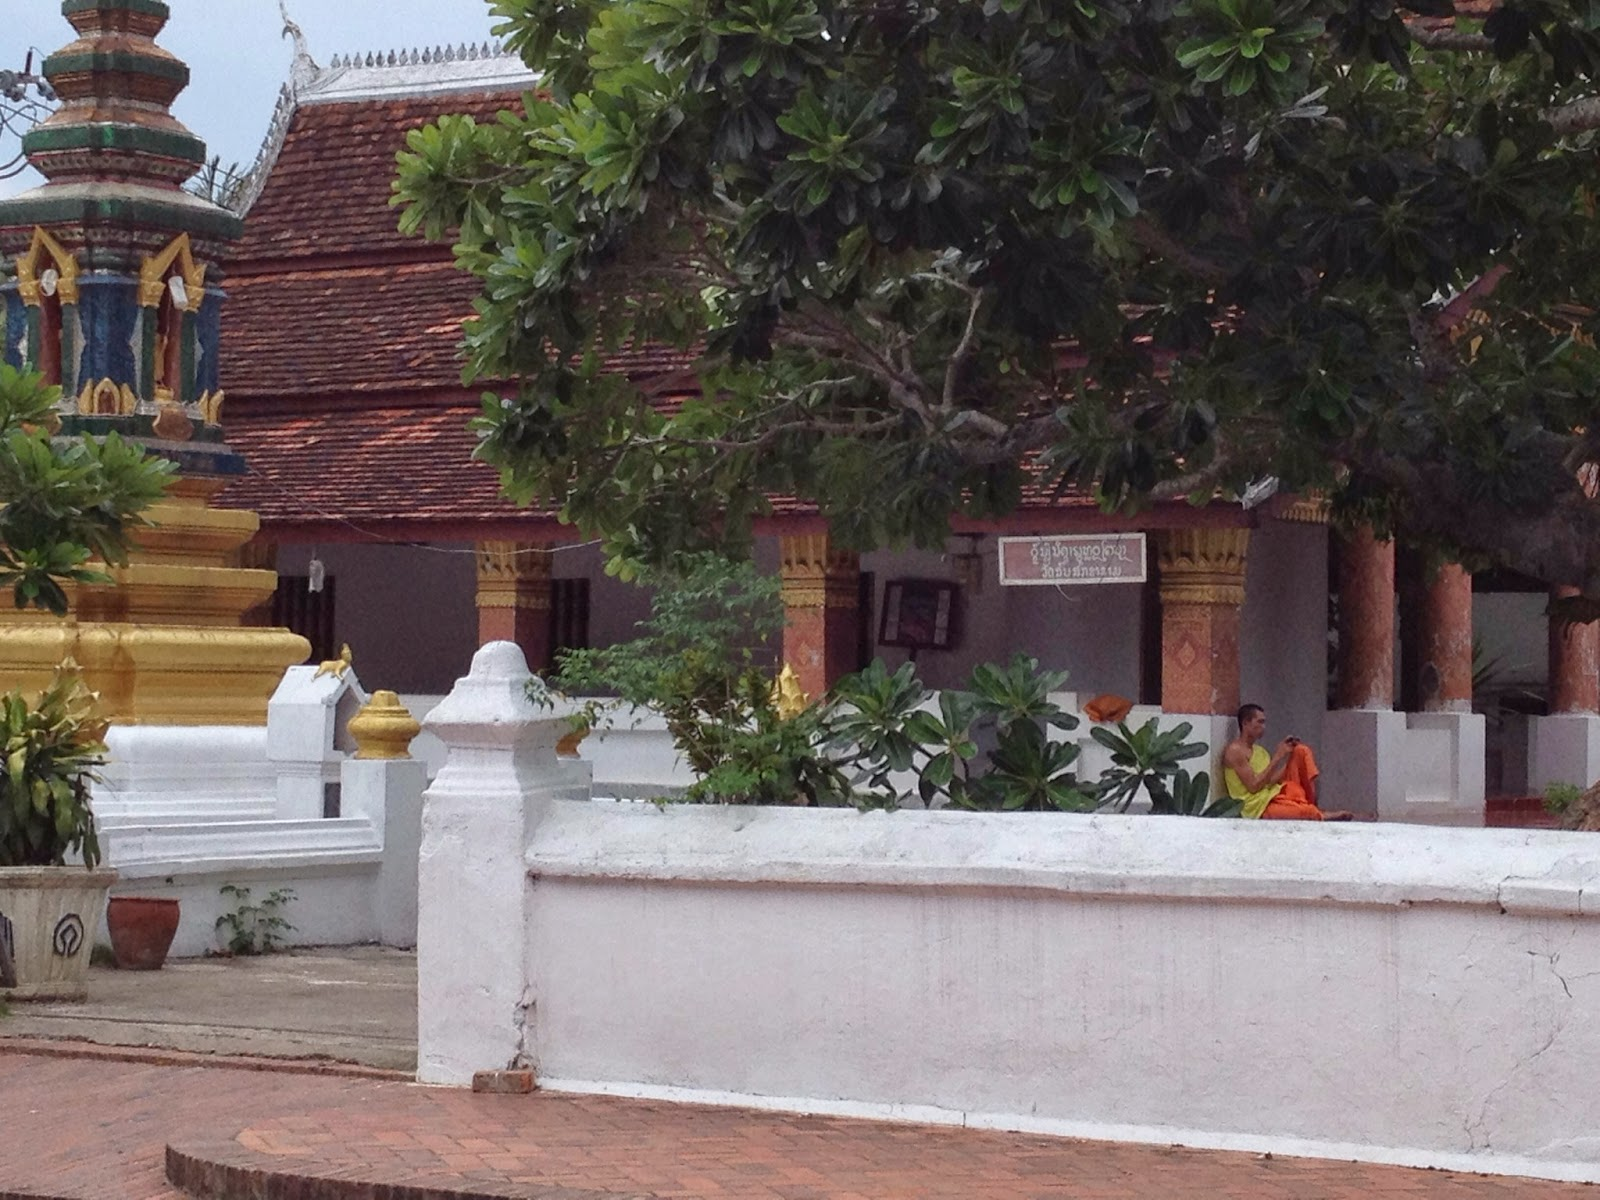 Luang Prabang - Even monks have smartphones